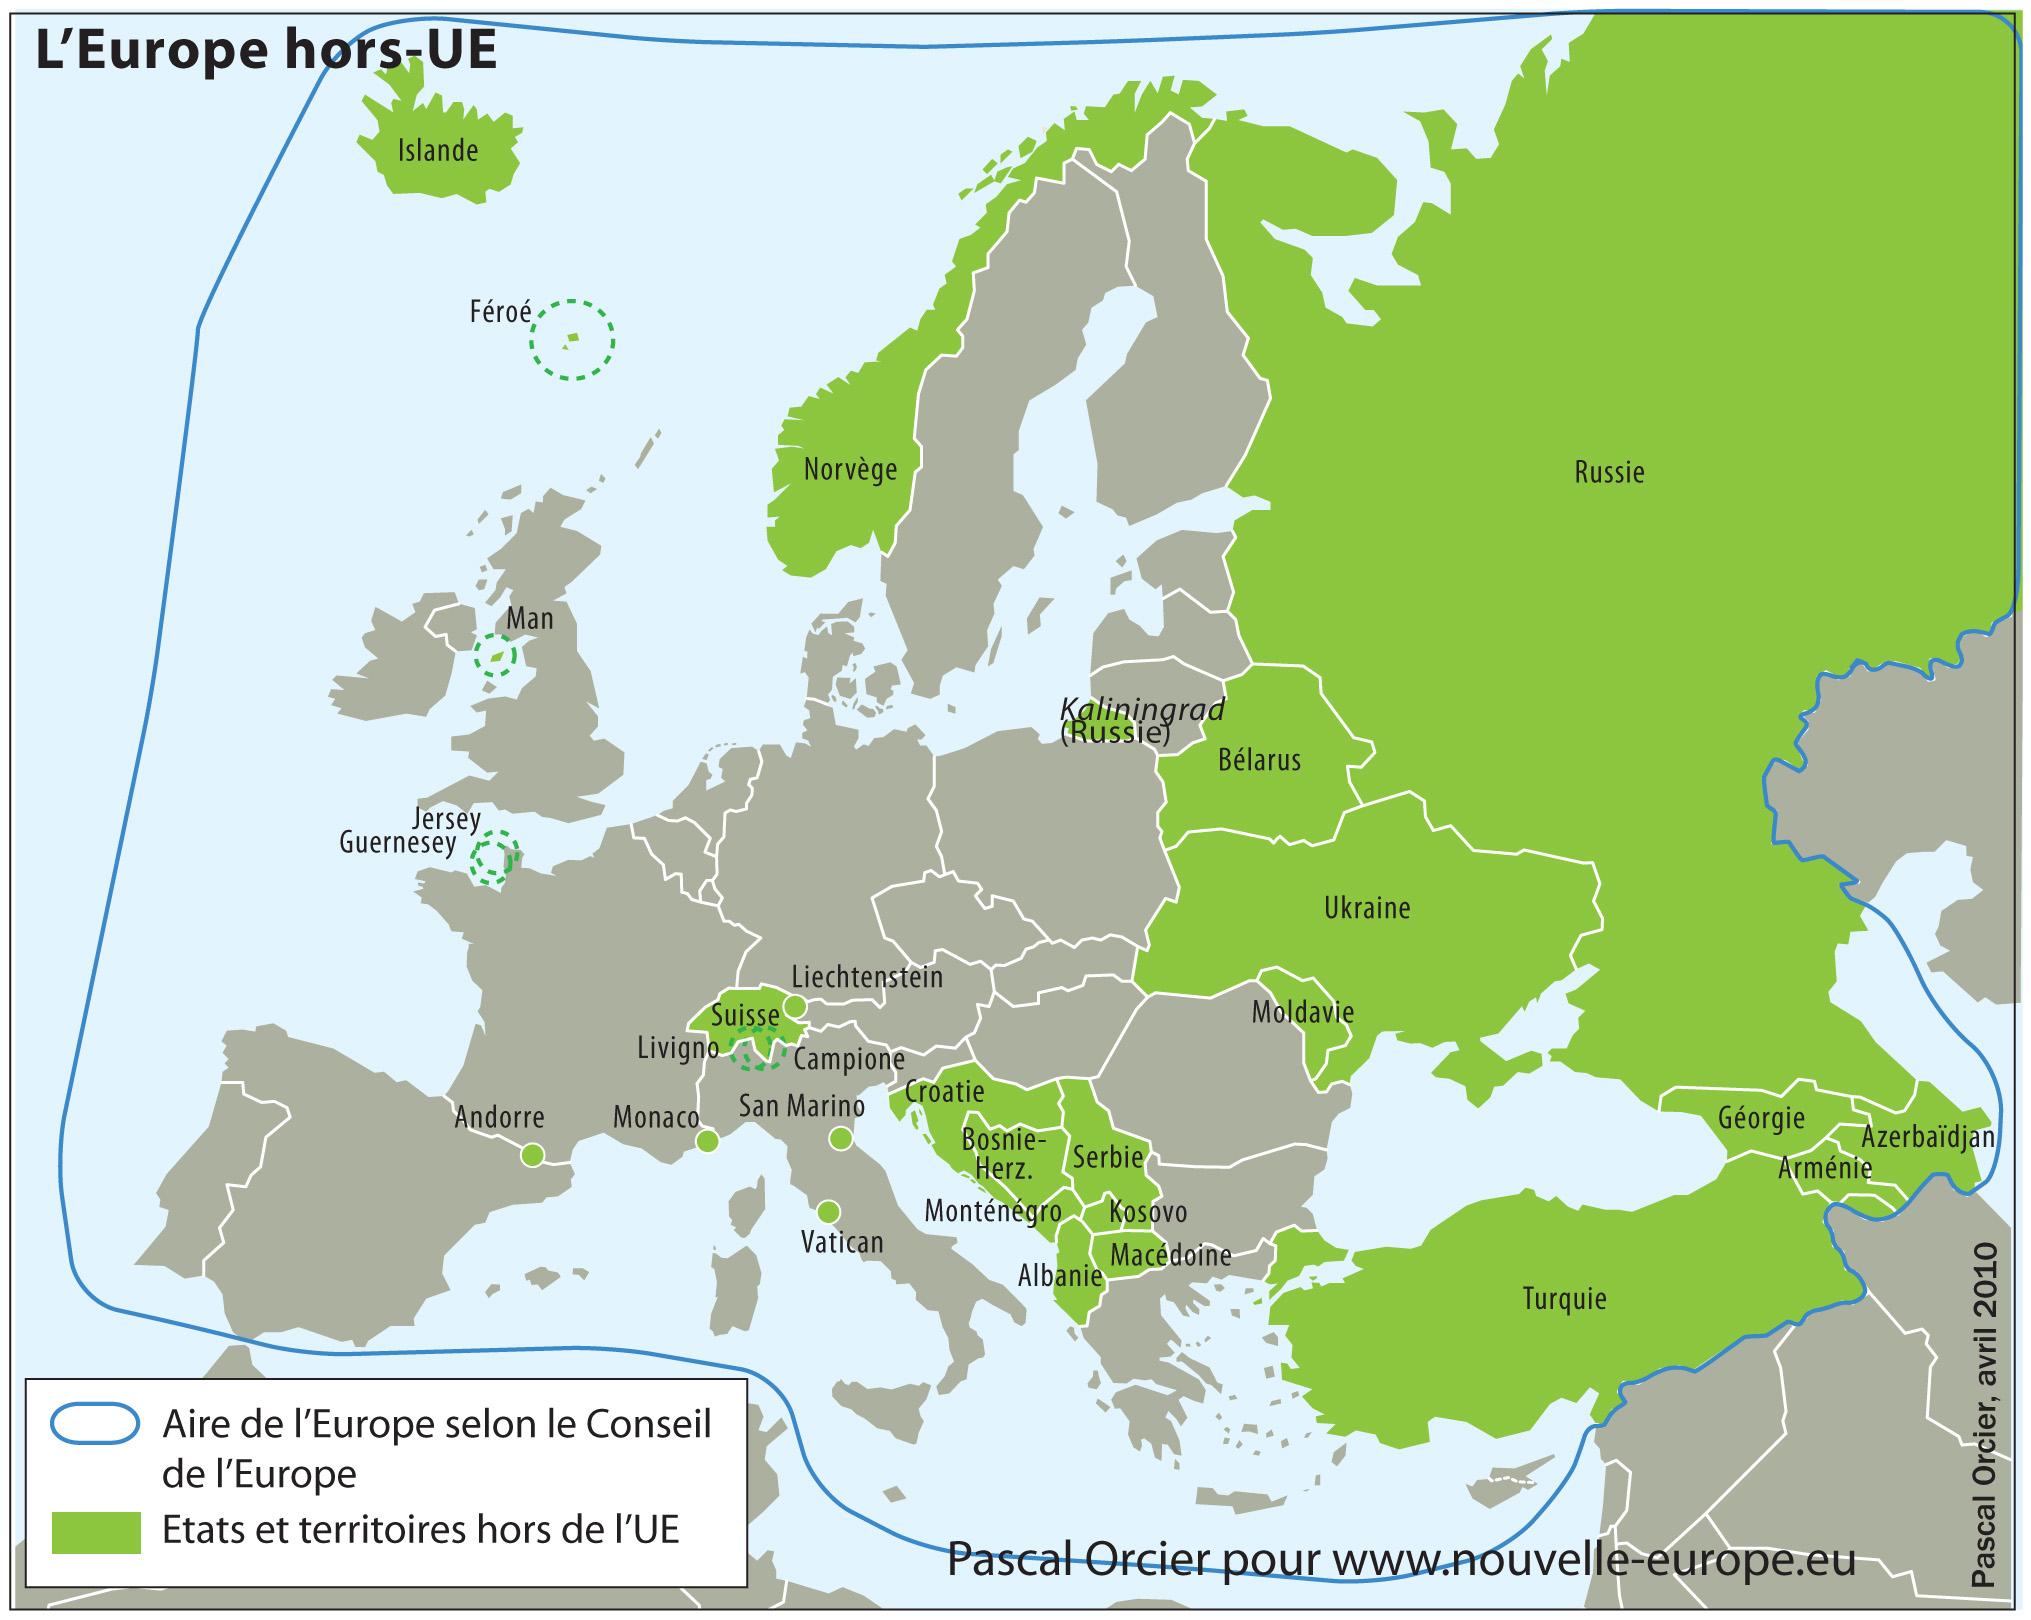 L'europe Hors-Ue   Nouvelle Europe encequiconcerne Carte Europe Pays Capitales